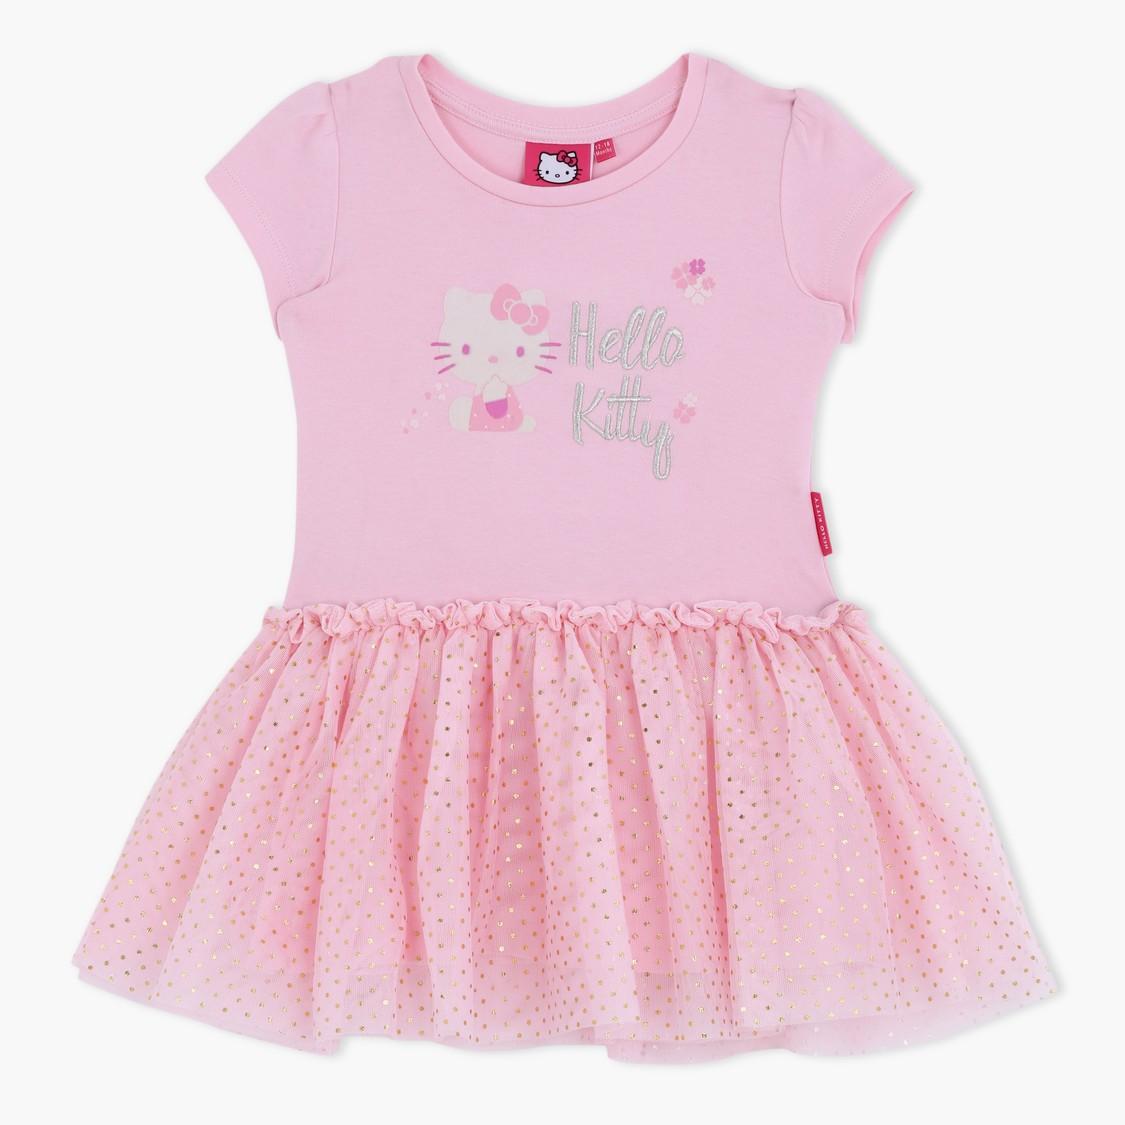 Hello Kitty Printed Short Sleeves Pleated Dress